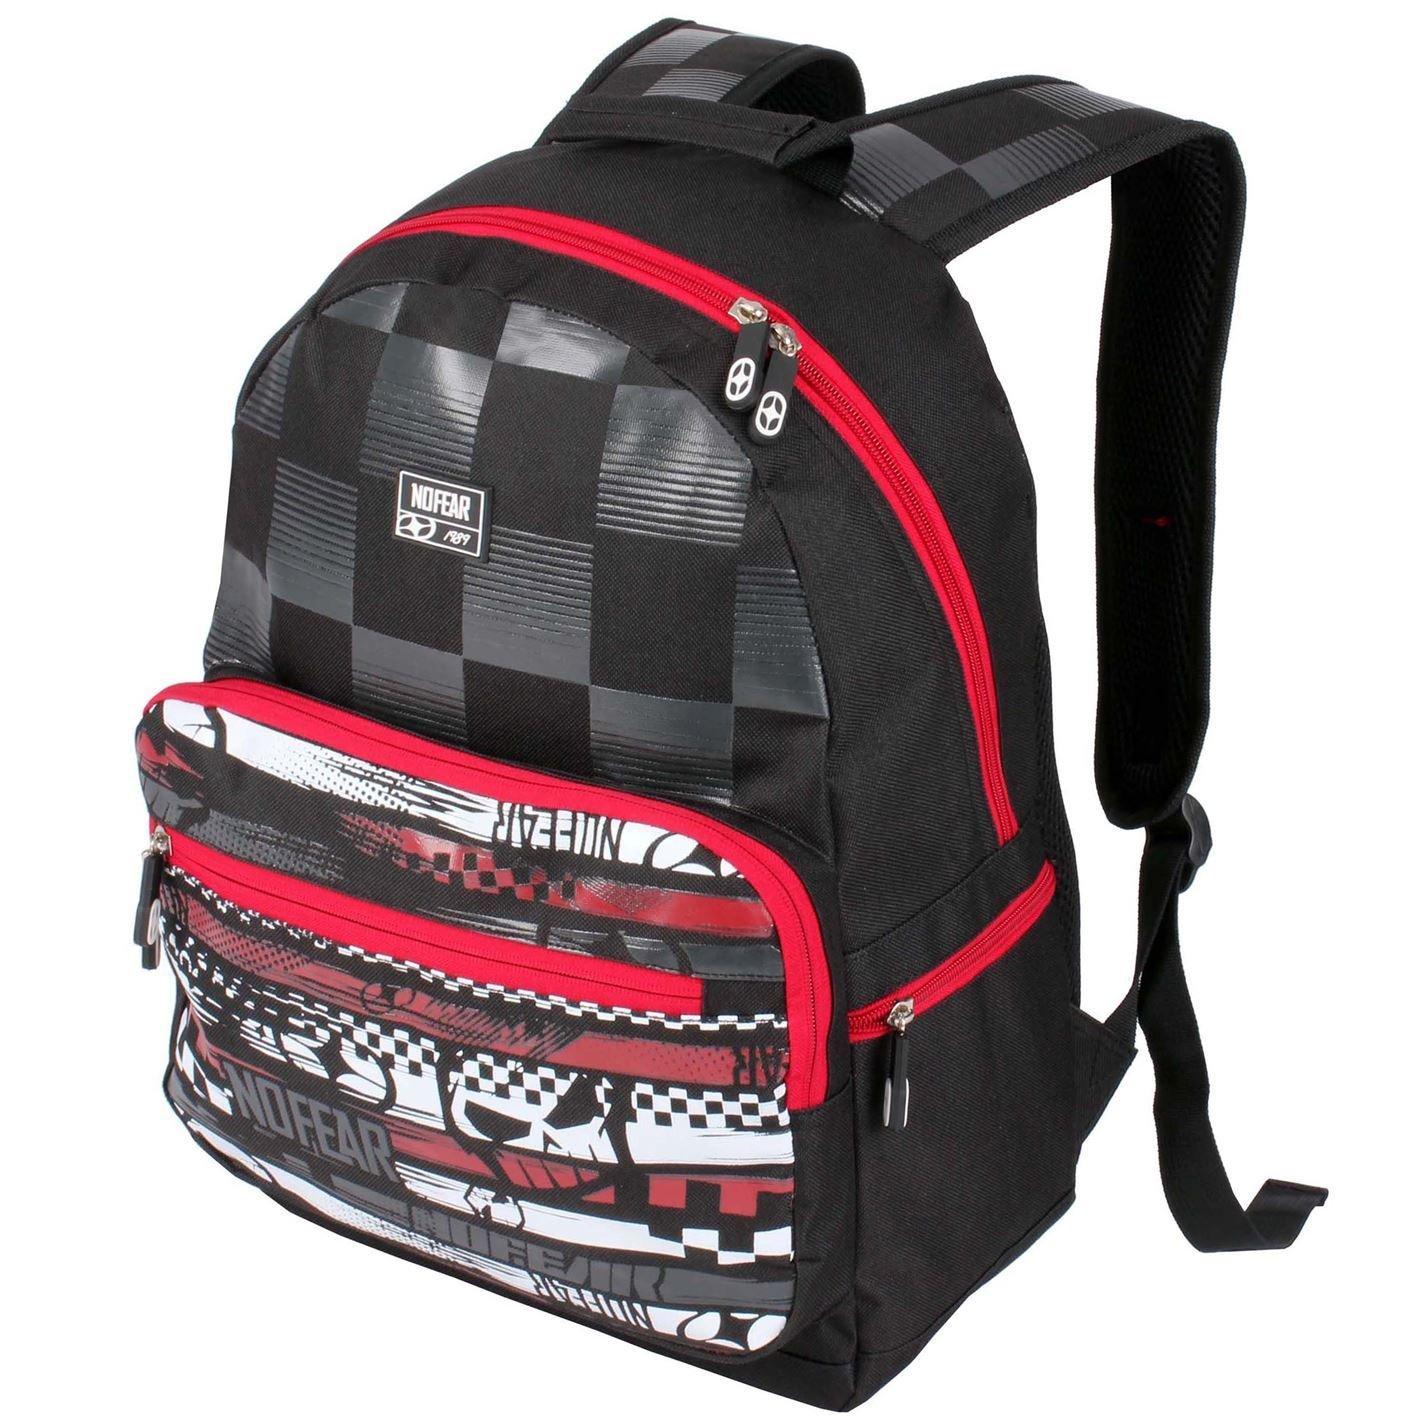 f2eb3c560f002 No Fear MX Skate Backpack Black Red White Rucksack Sports Bag Gymbag Kitbag  H  44cm  W  38cm  D  8cm.  Amazon.co.uk  Sports   Outdoors